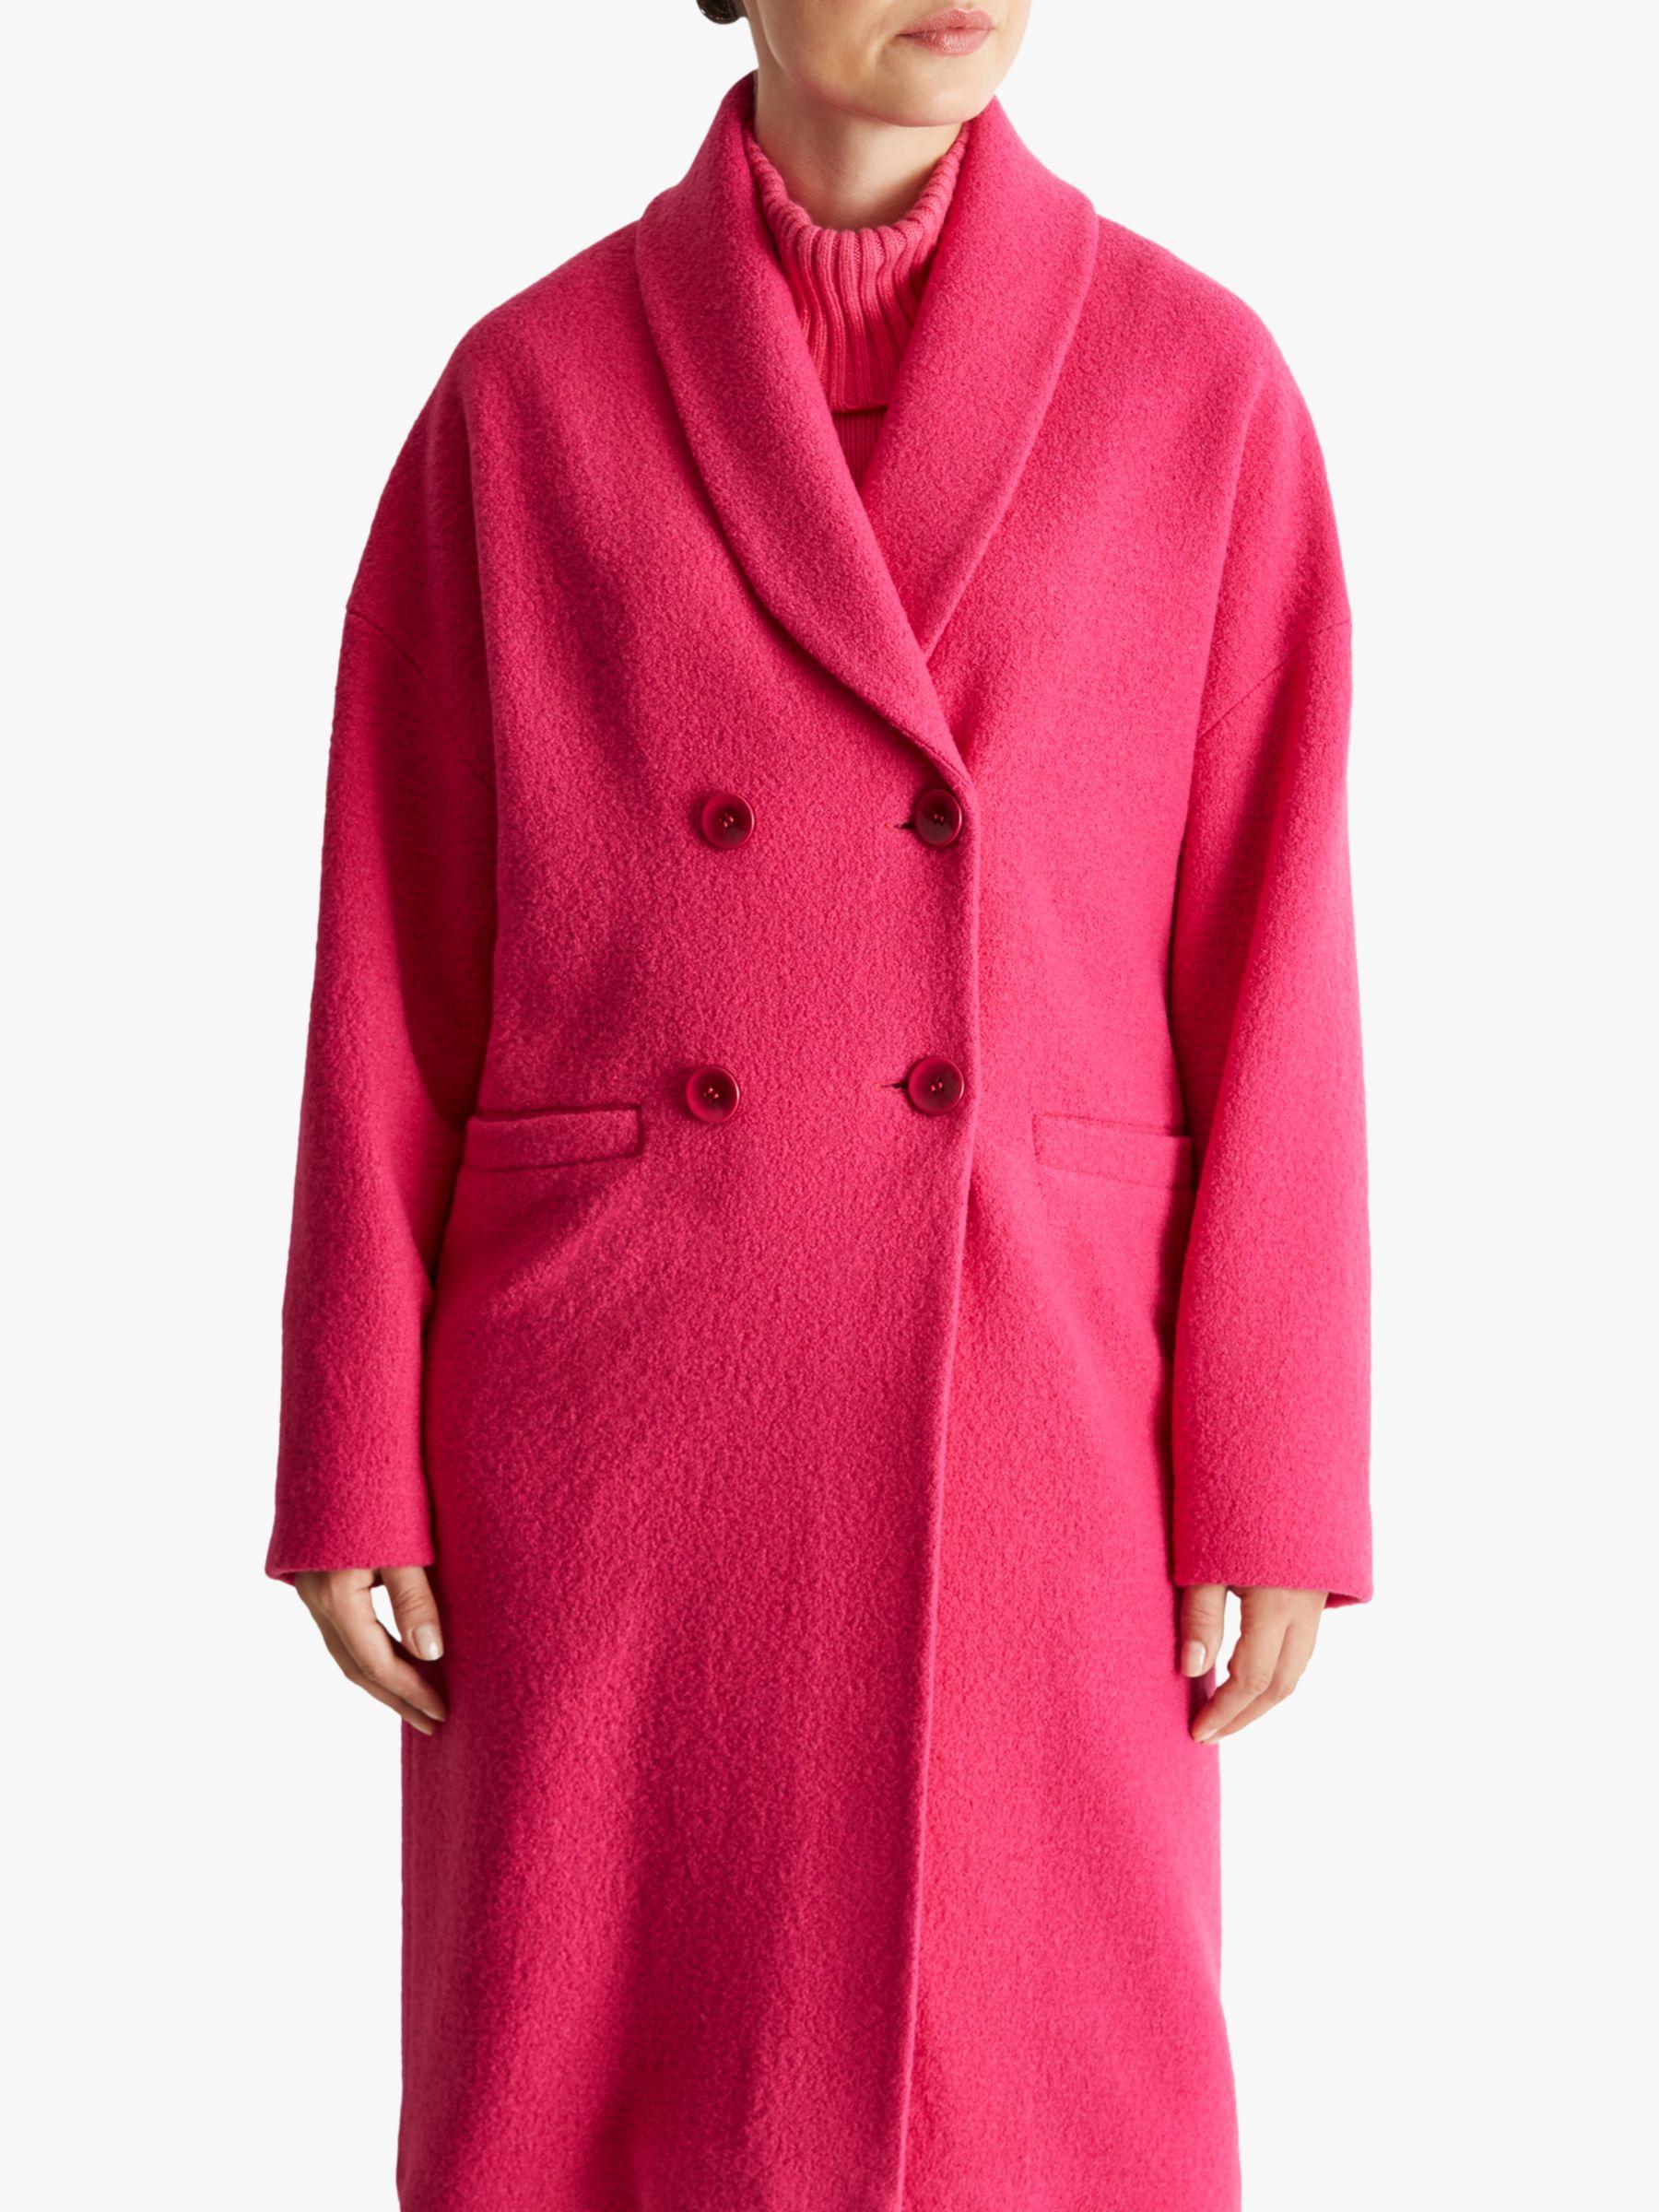 Fenn Wright Manson Fenn Wright Manson Paulette Coat, Pink